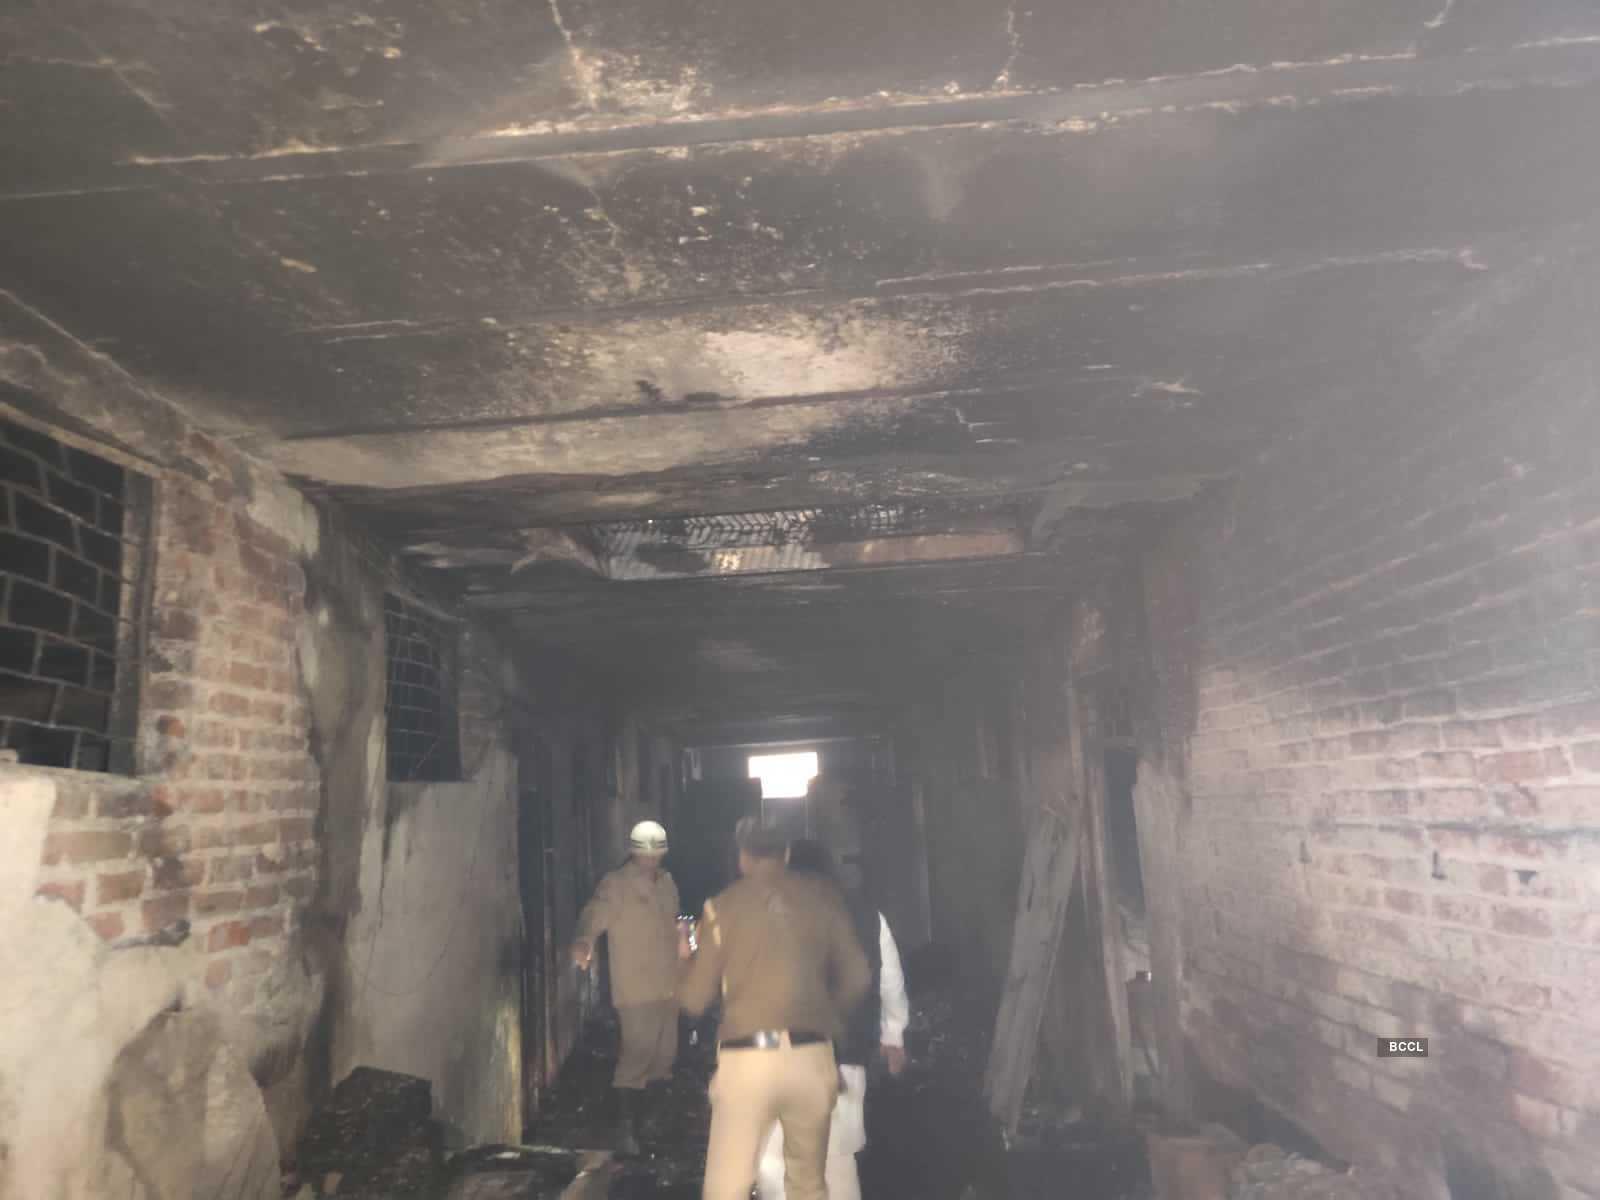 Horrific pictures from the site of massive fire in Delhi's Anaj Mandi